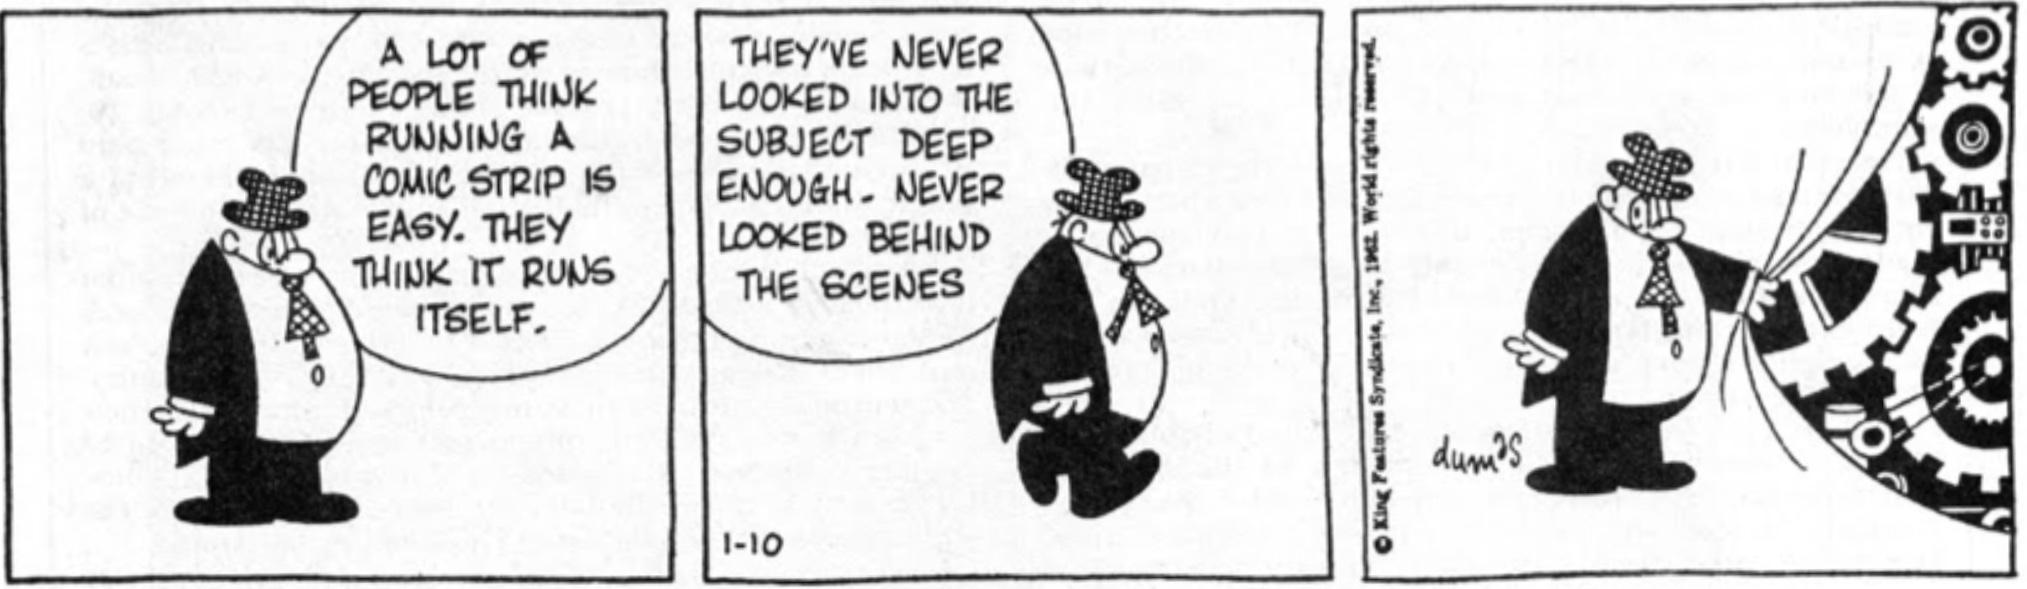 Sam's strip från 10 januari 1962